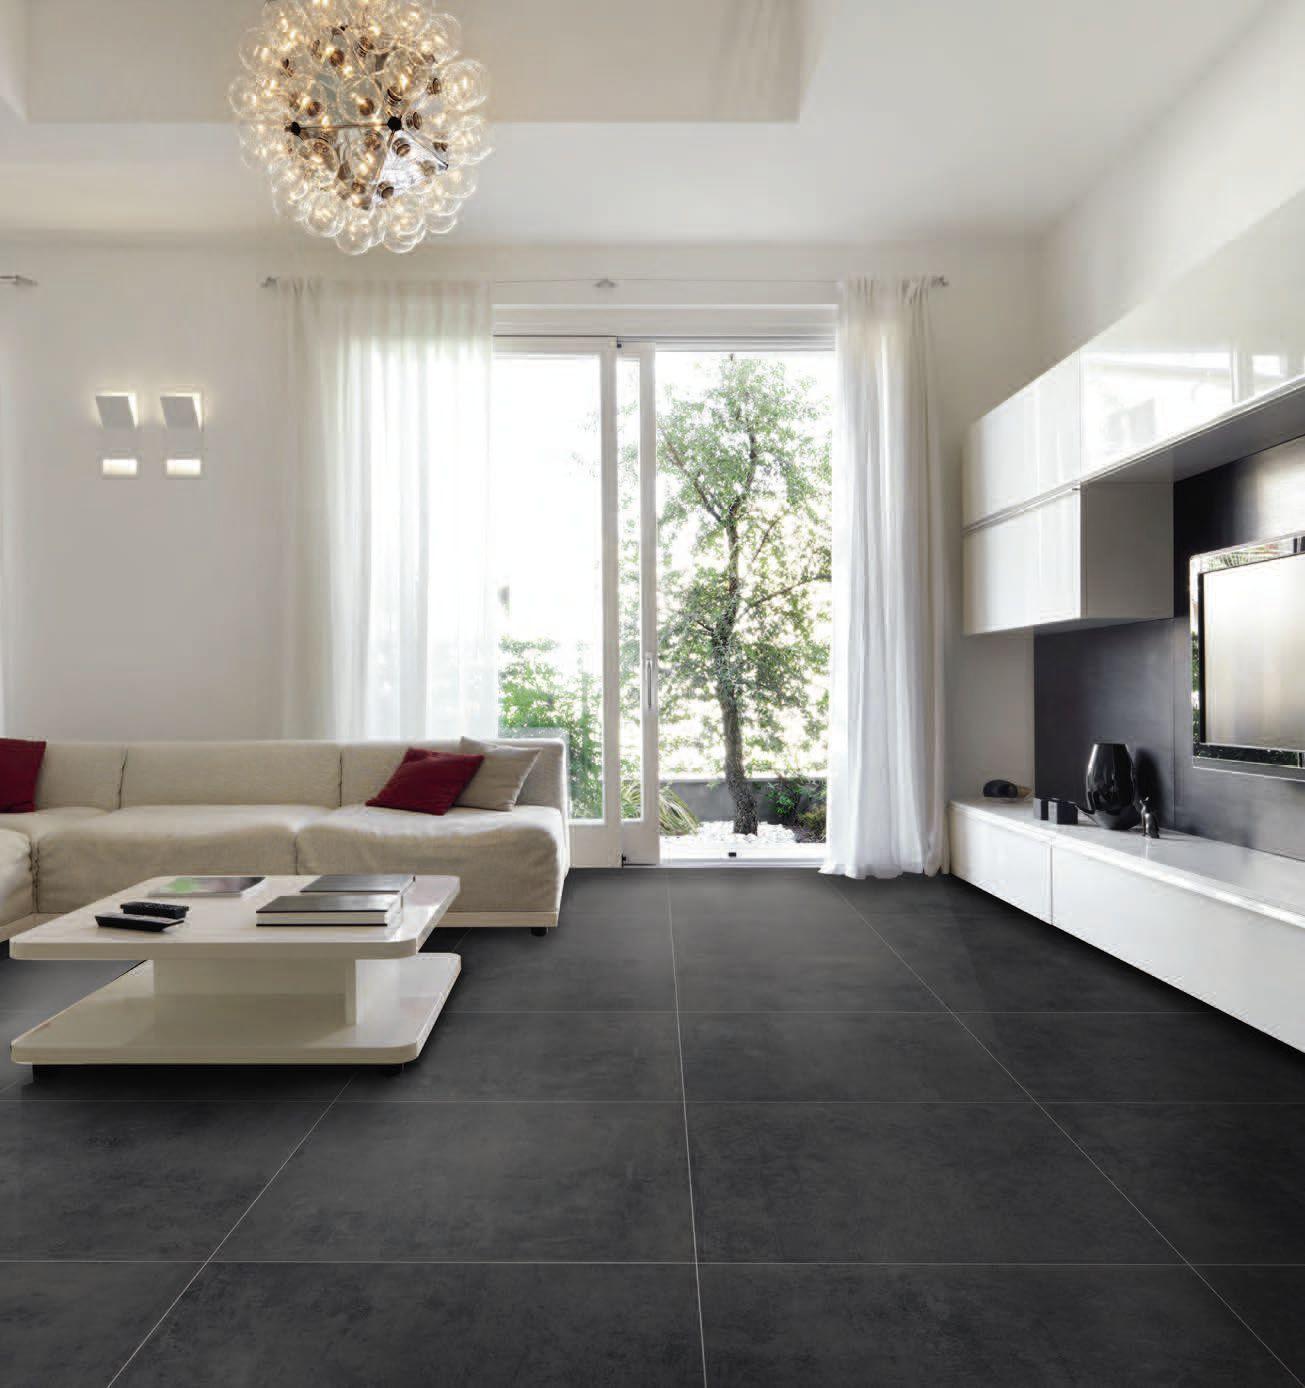 Fußboden Dunkel Egger Pro Classic Laminat Landhausdiele 1 Stab